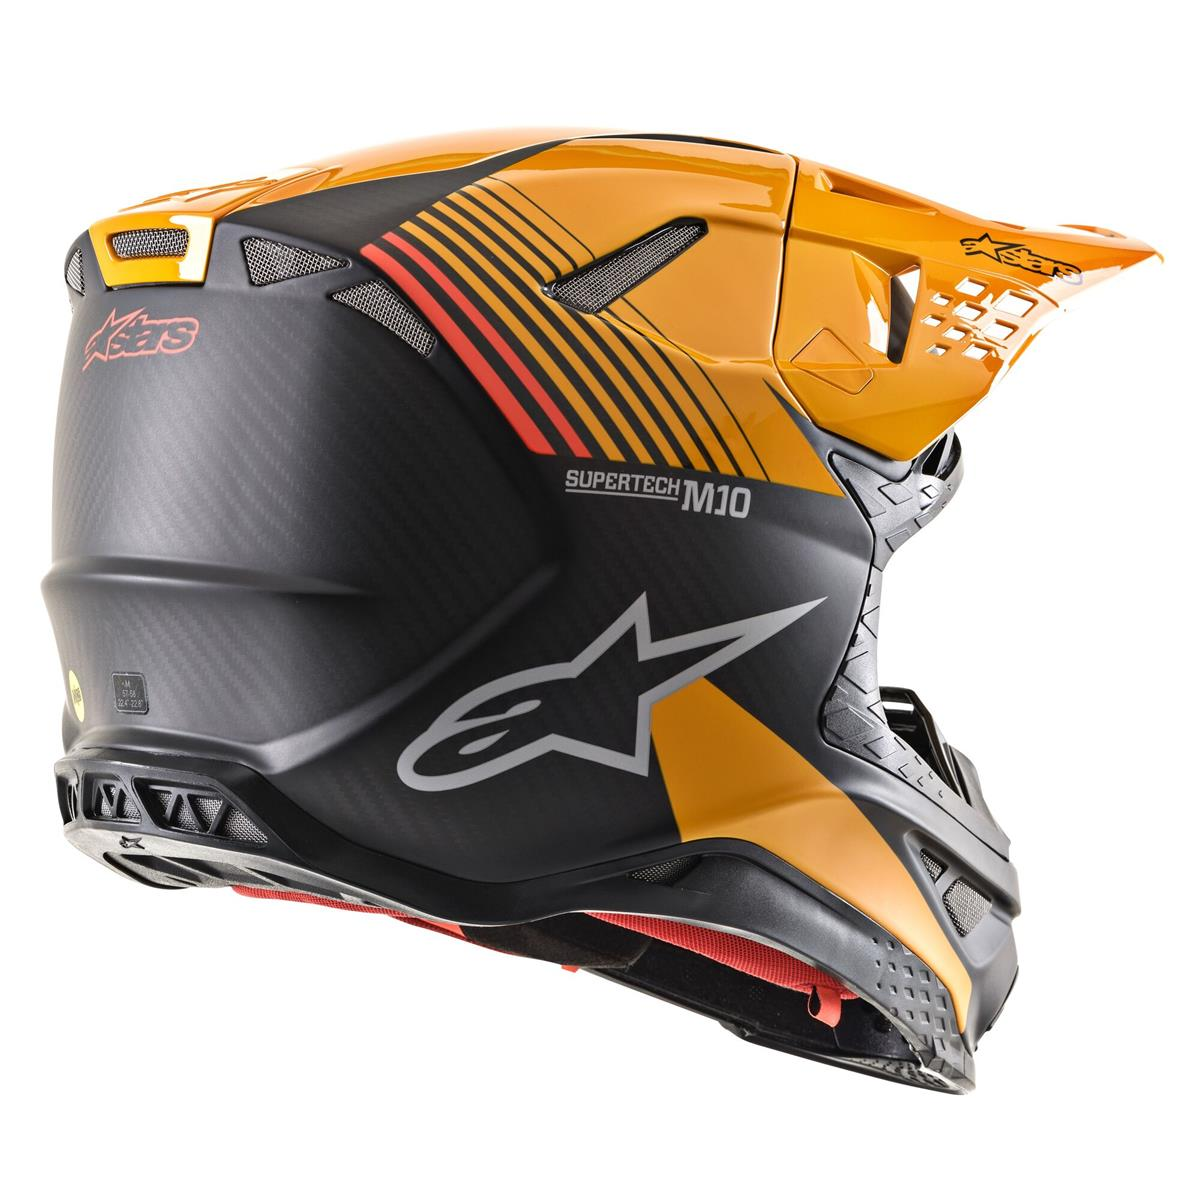 alpinestars-mx-helm-mx-helmet-supertech-s-m10-1